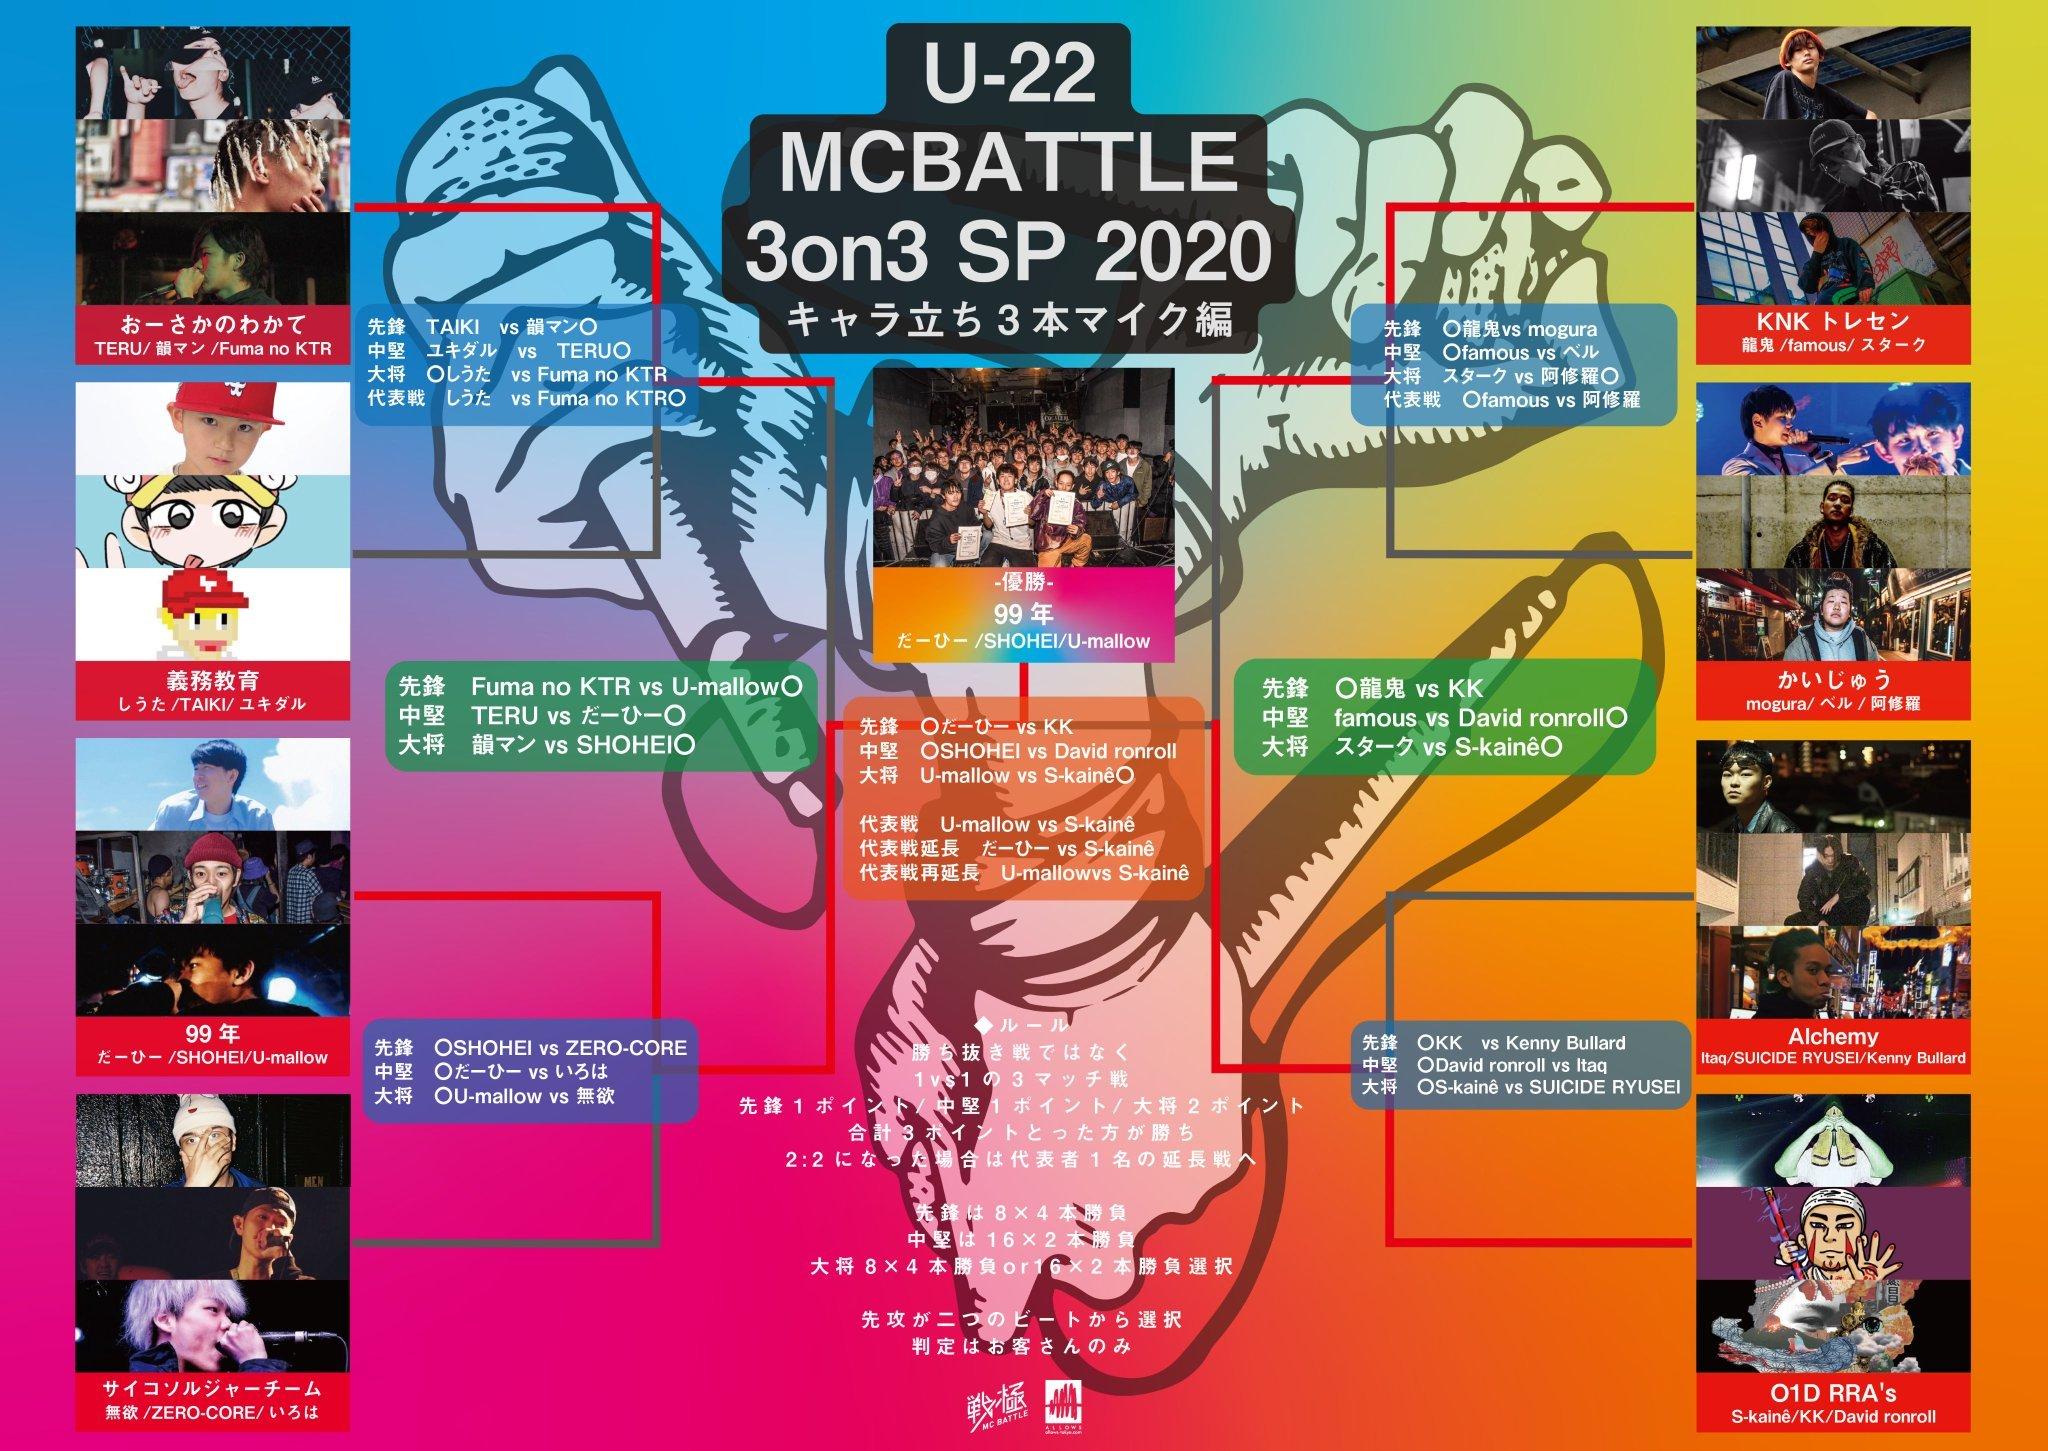 2/1 U-22 MCBATTLE 3on3 SP 2020-キャラ立ち3本マイク-優勝は..._e0246863_03093696.jpg